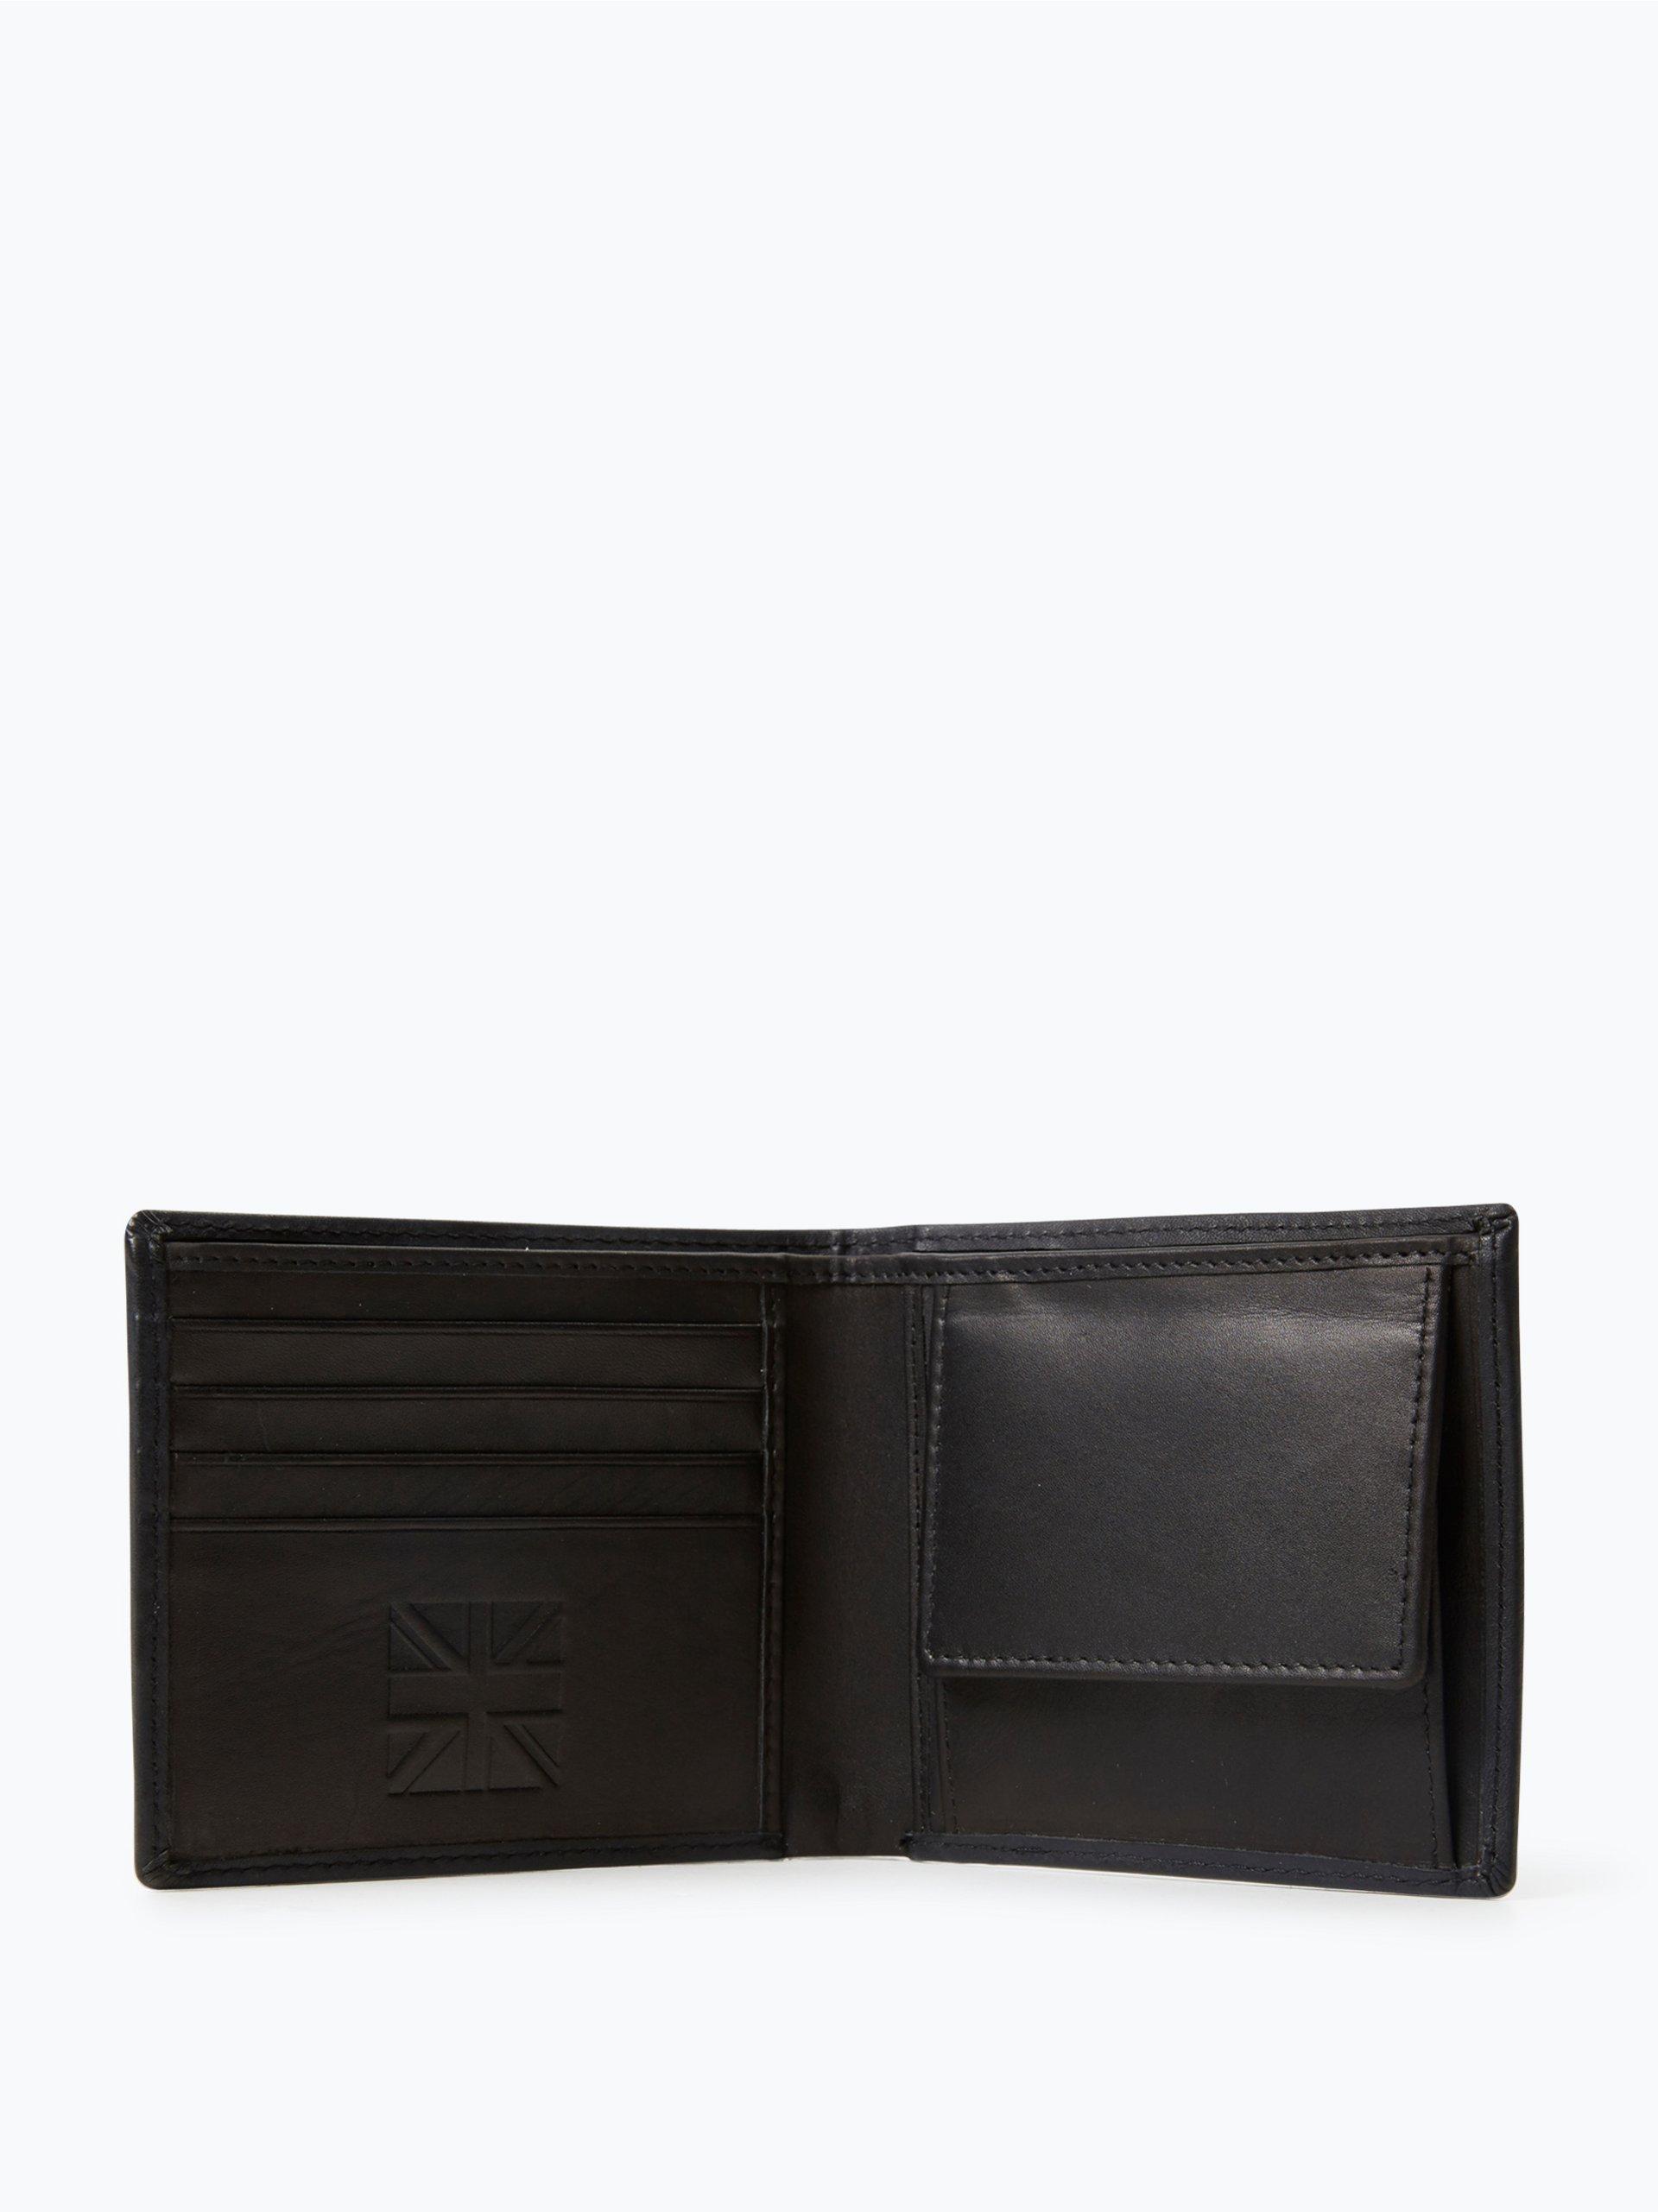 Finshley & Harding London Herren Geldbörse aus Leder